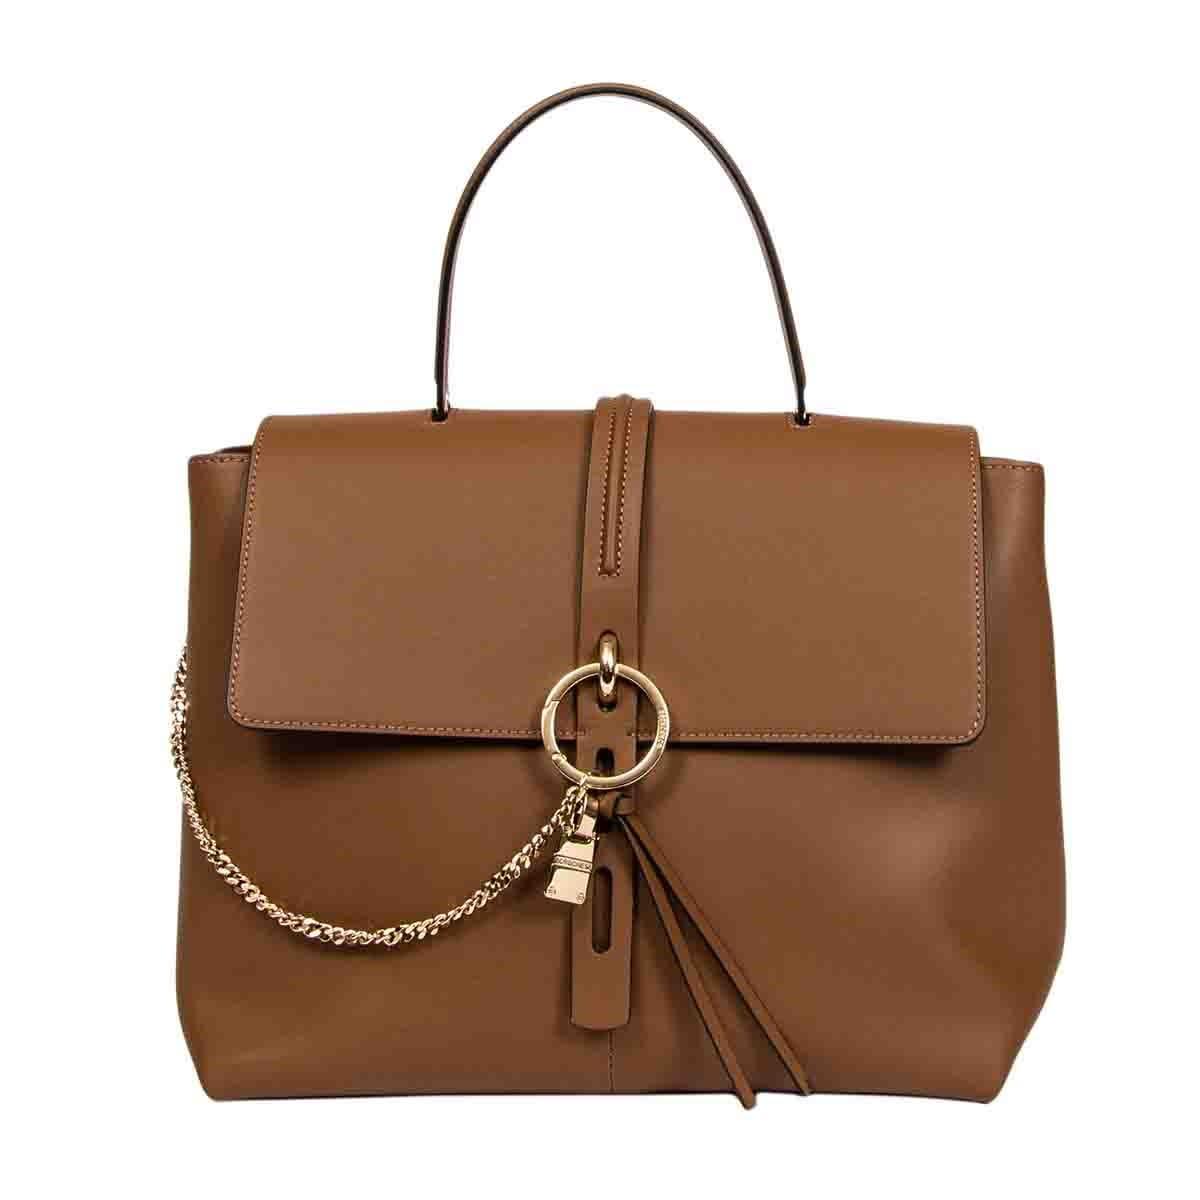 Borbonese Medium Handbag